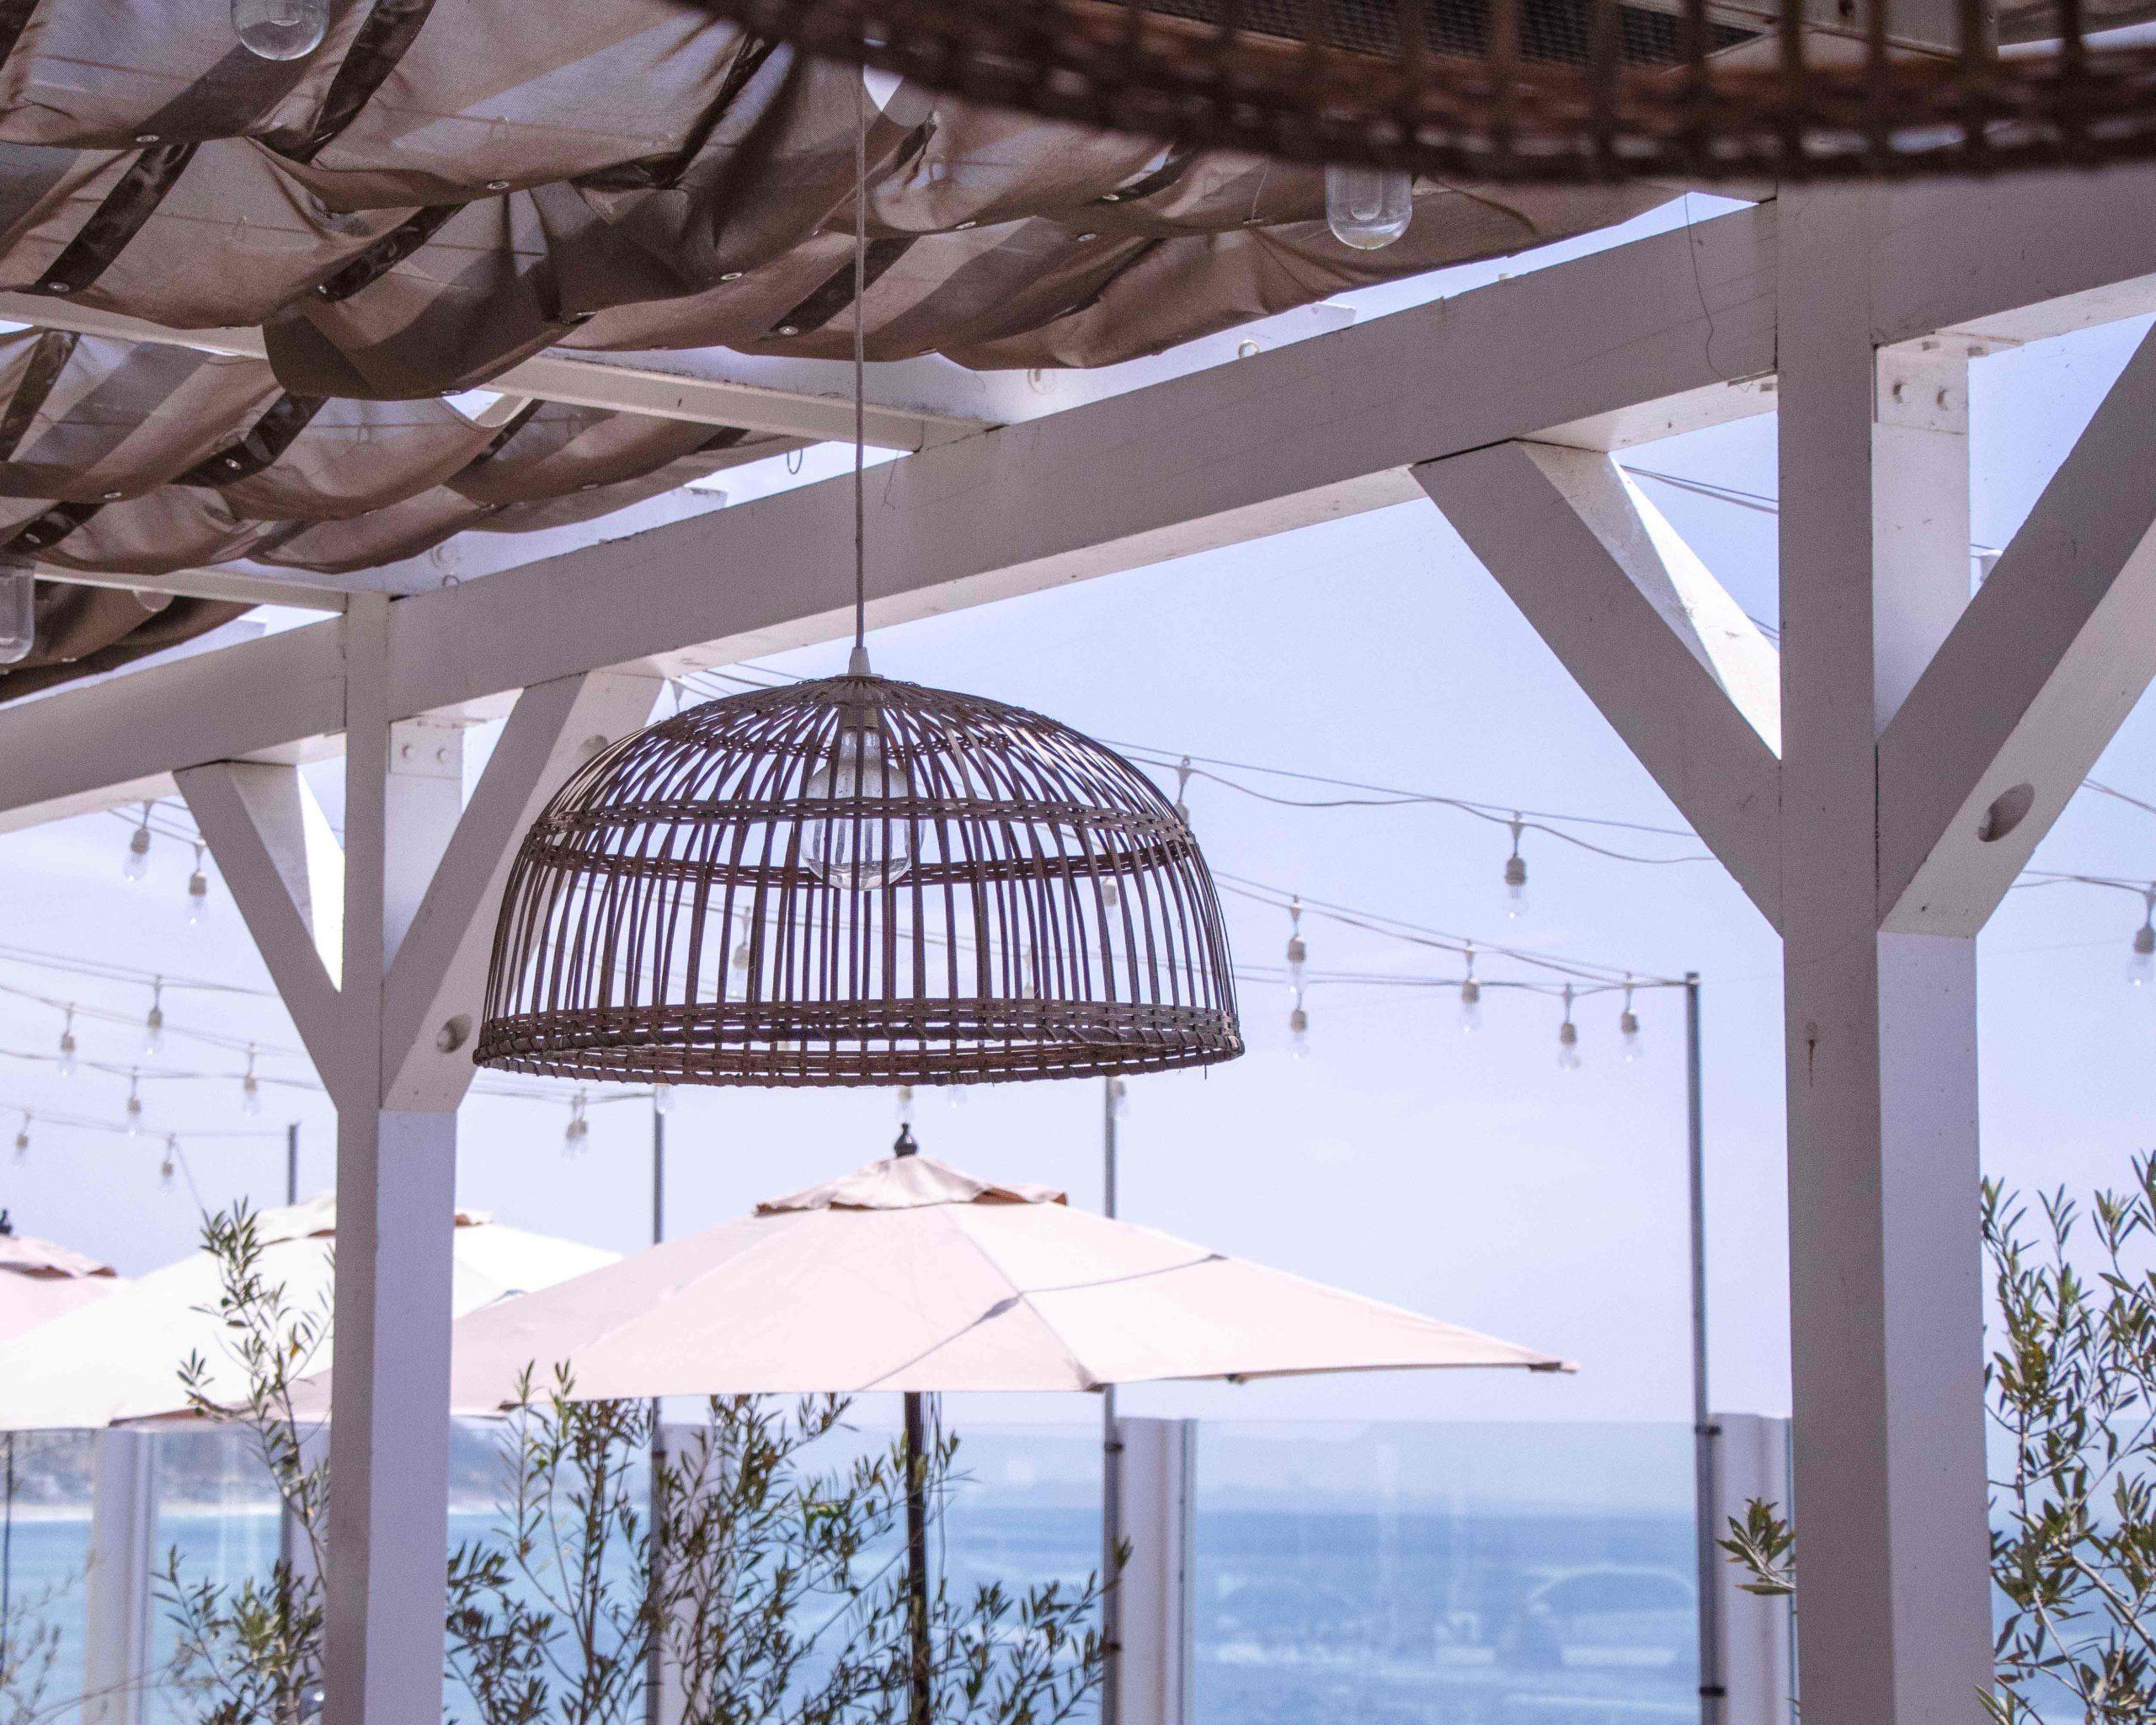 Malibu Farm: Organic Lunch Place in Malibu